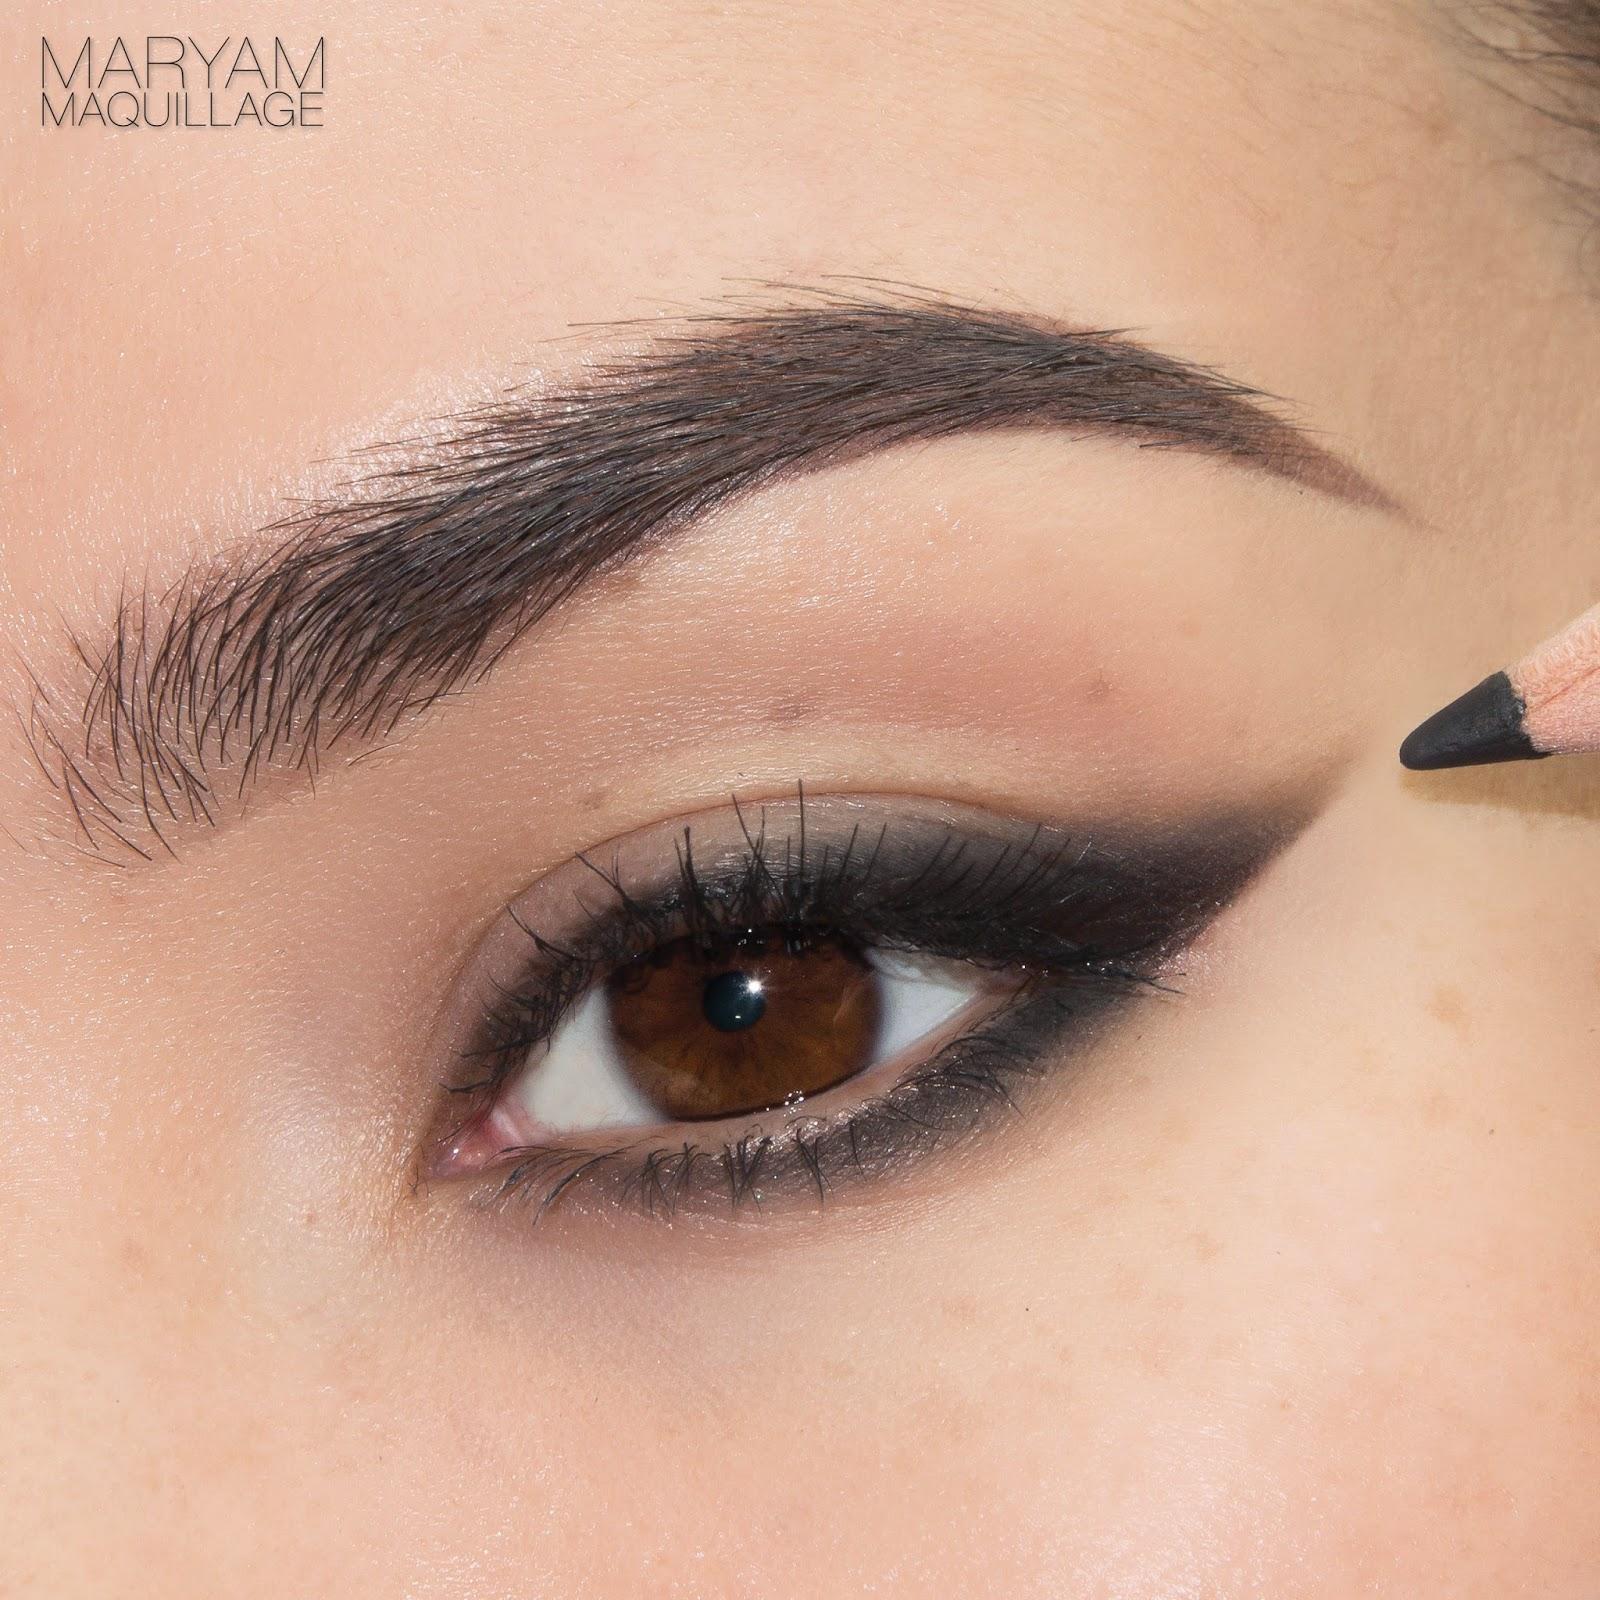 Maryam Maquillage Eyeliner Finder Four Liner Looks